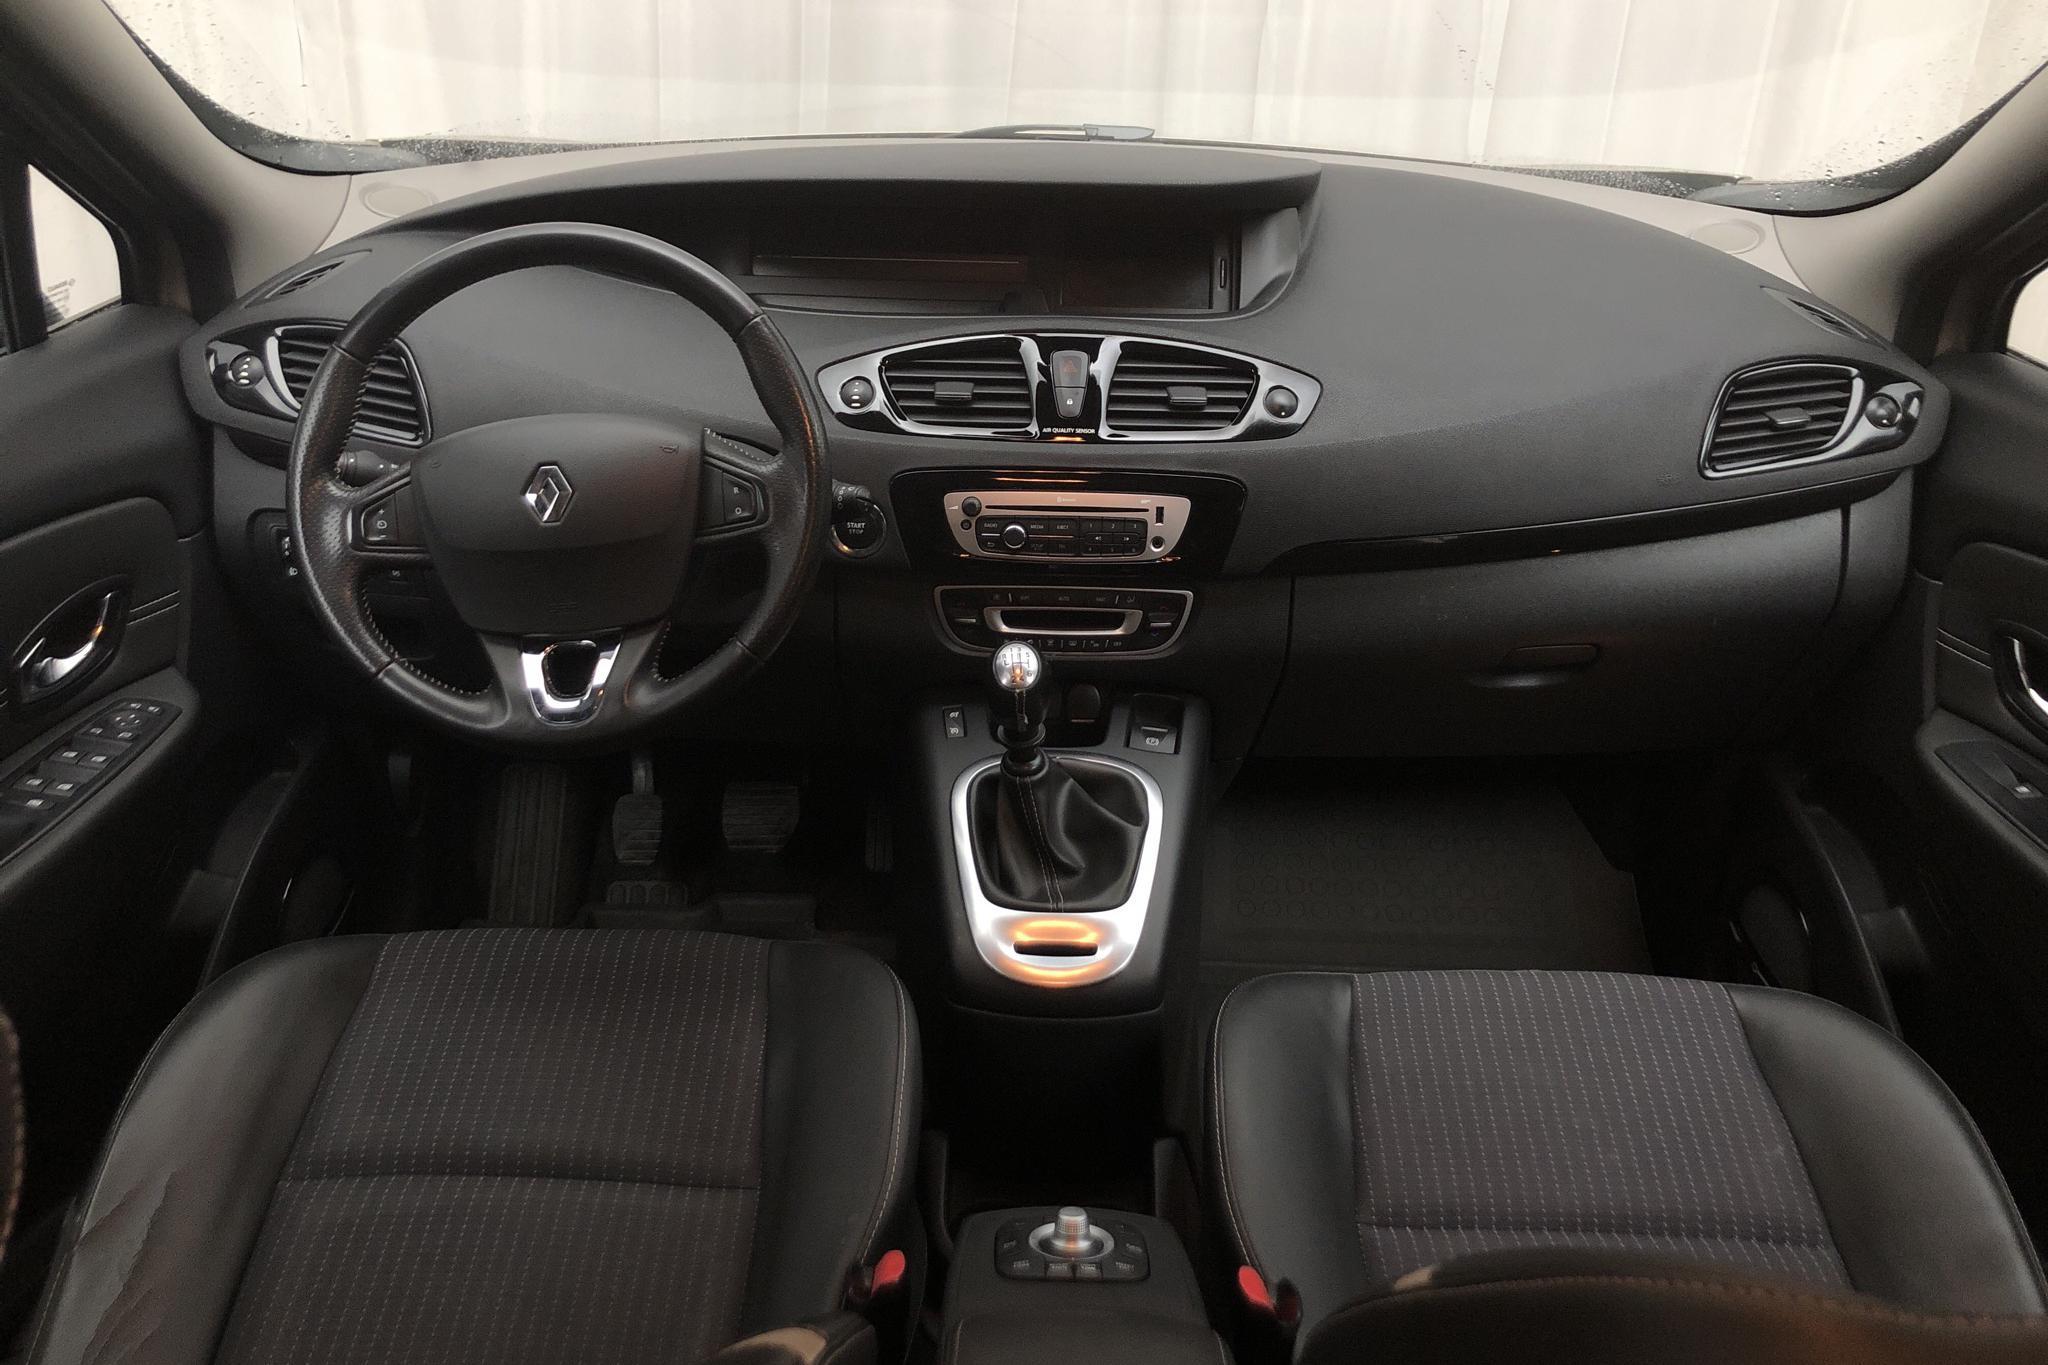 Renault Grand Scénic III 1.6 dCi (130hk) - 16 992 mil - Manuell - 2013